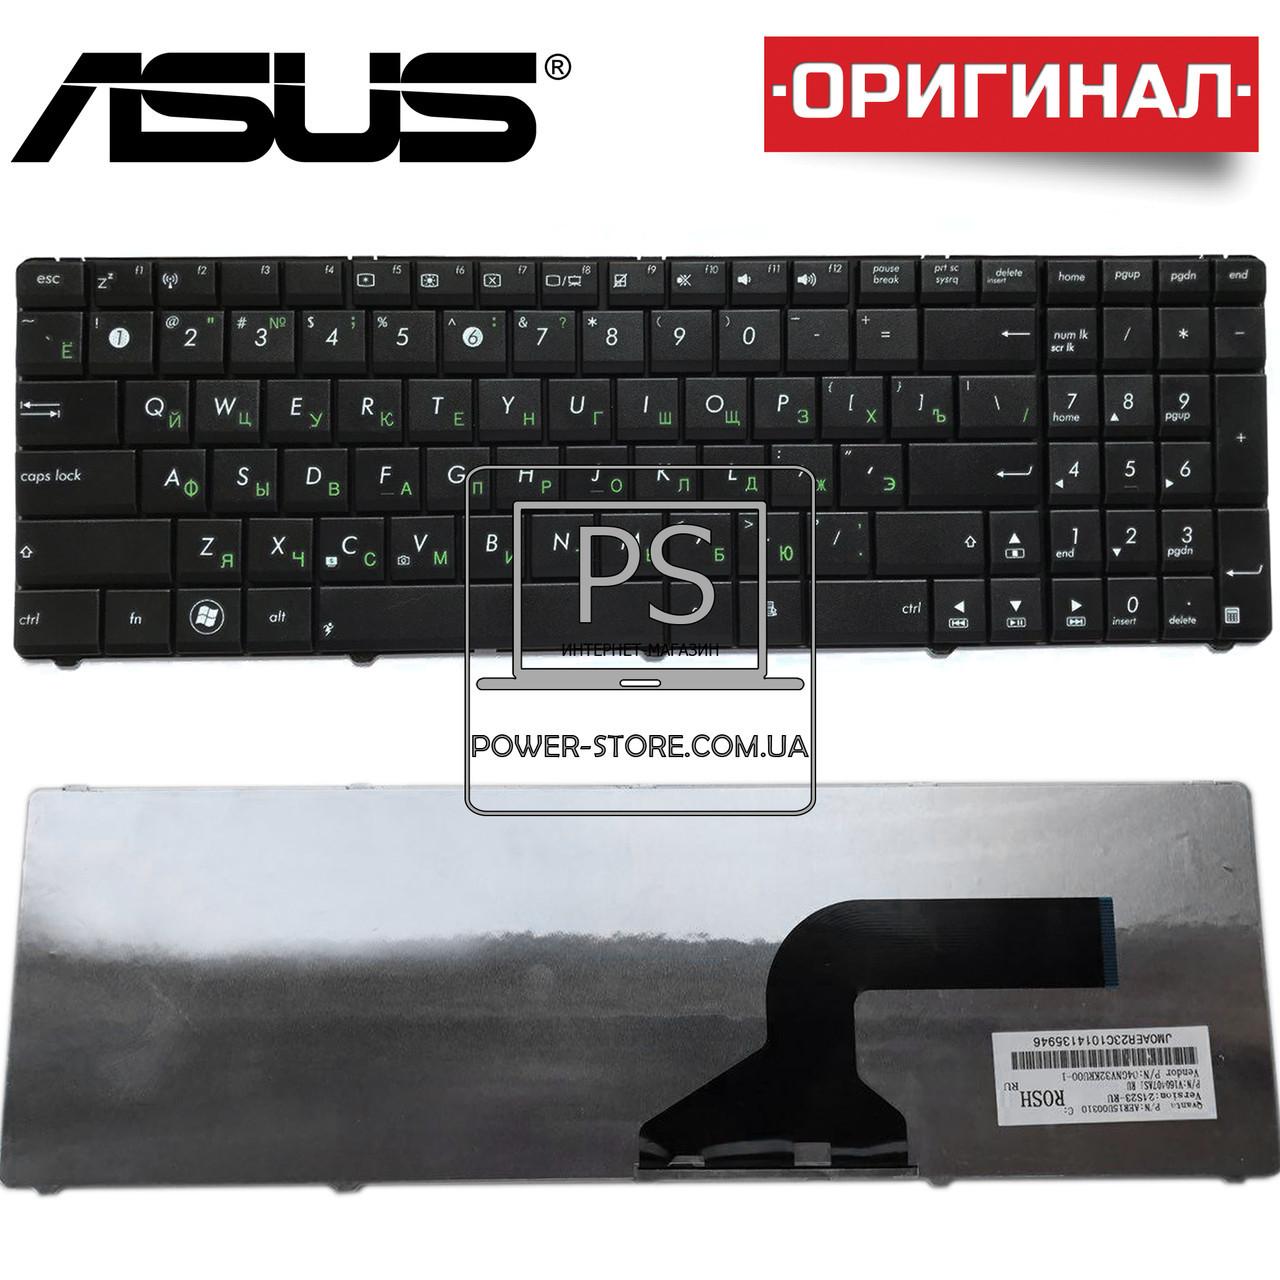 Клавиатура для ноутбука ASUS  04GNV32KUI00-6, 04GNV32KUI01-3, 04GNV32KUK00, 04GNV32KUK00-1,